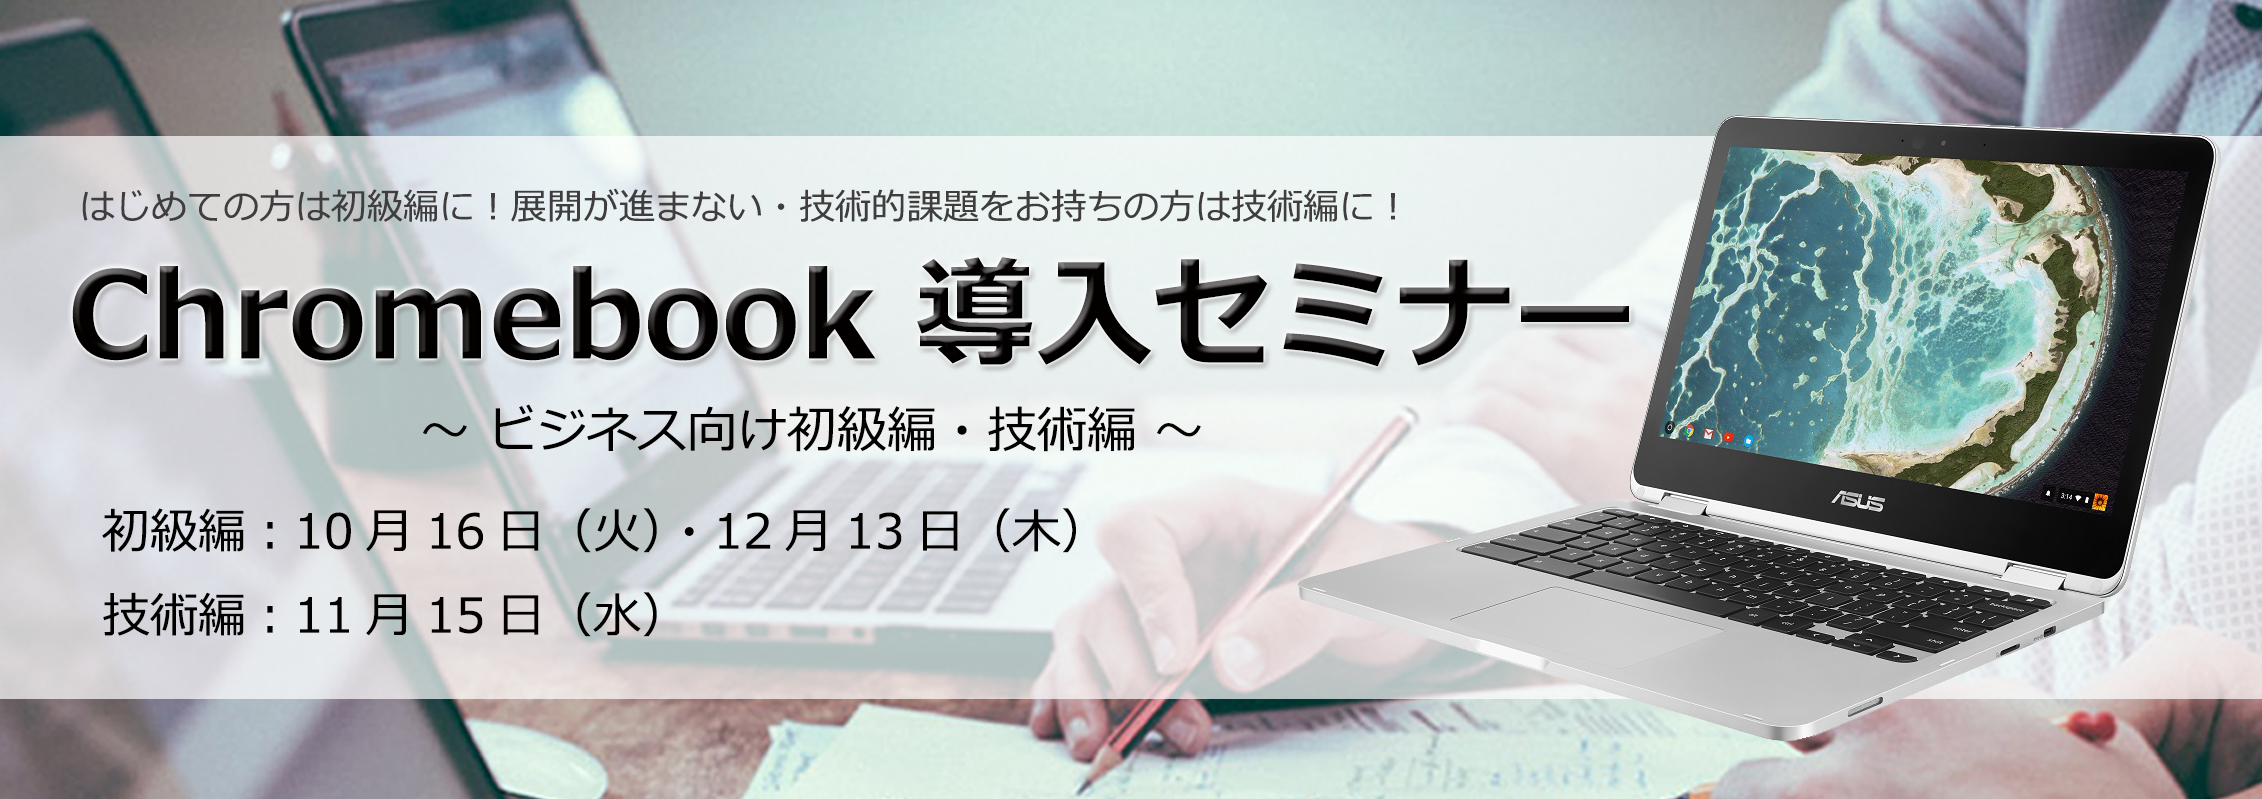 Chromebook 導入セミナー(初級編)